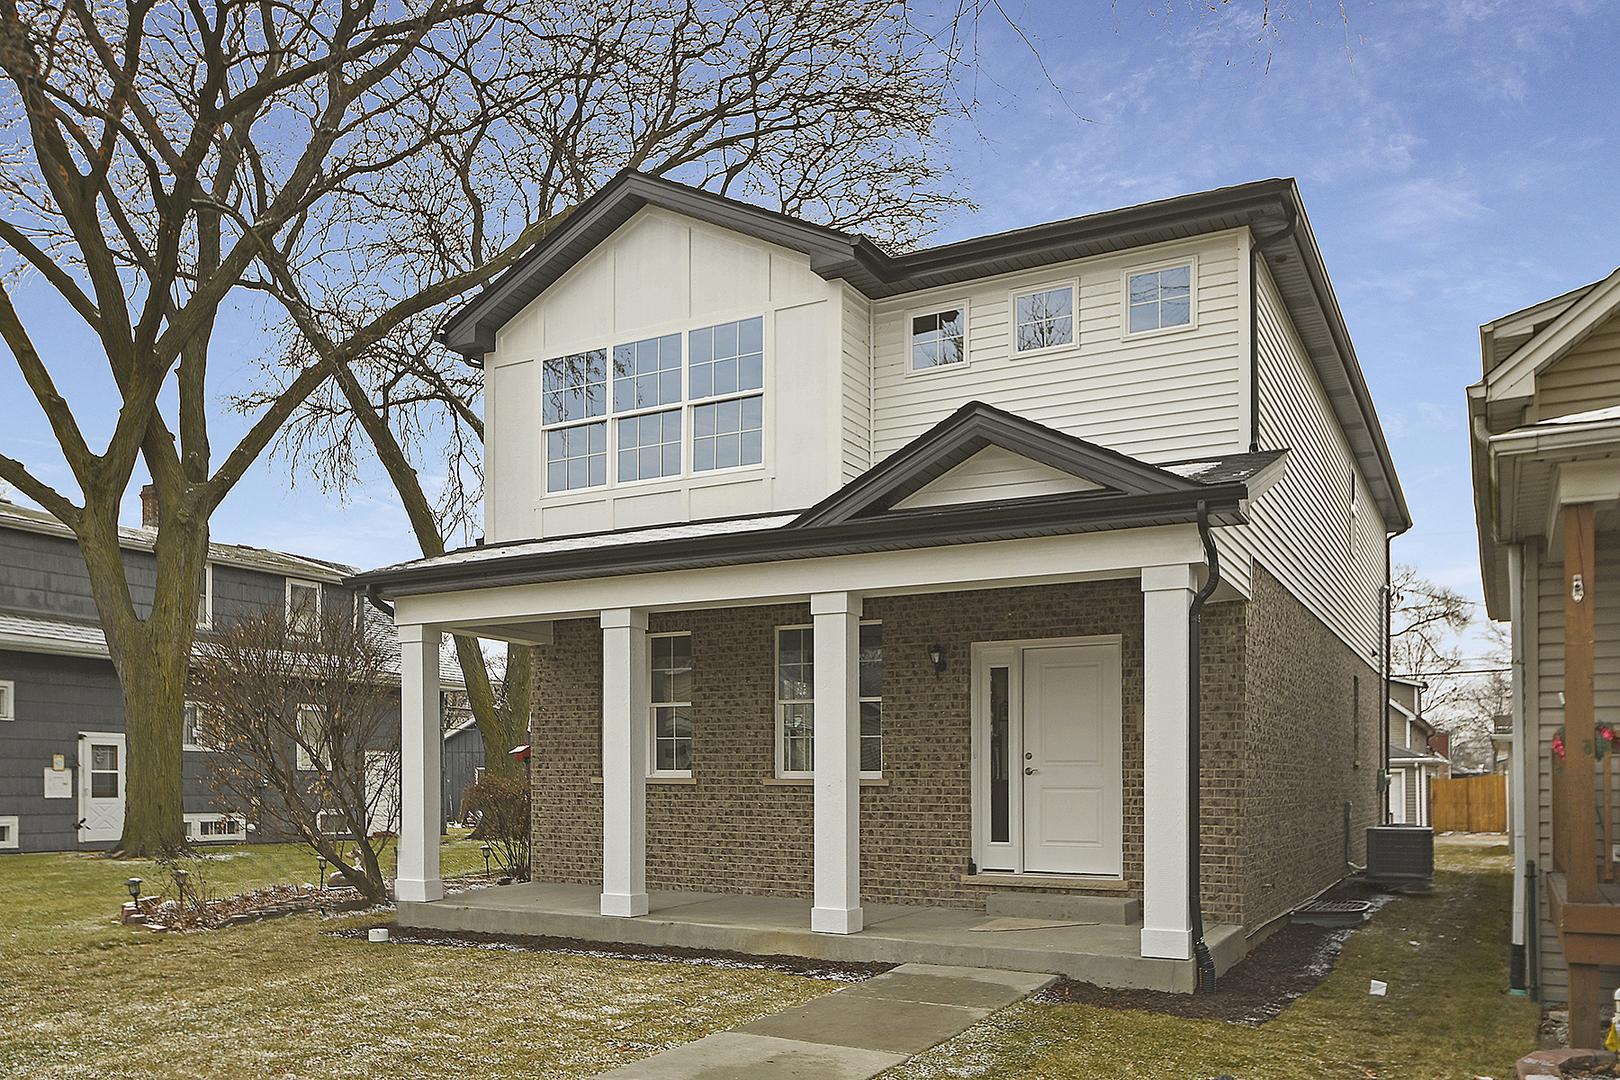 7808 West 66th, Bedford Park, Illinois, 60501